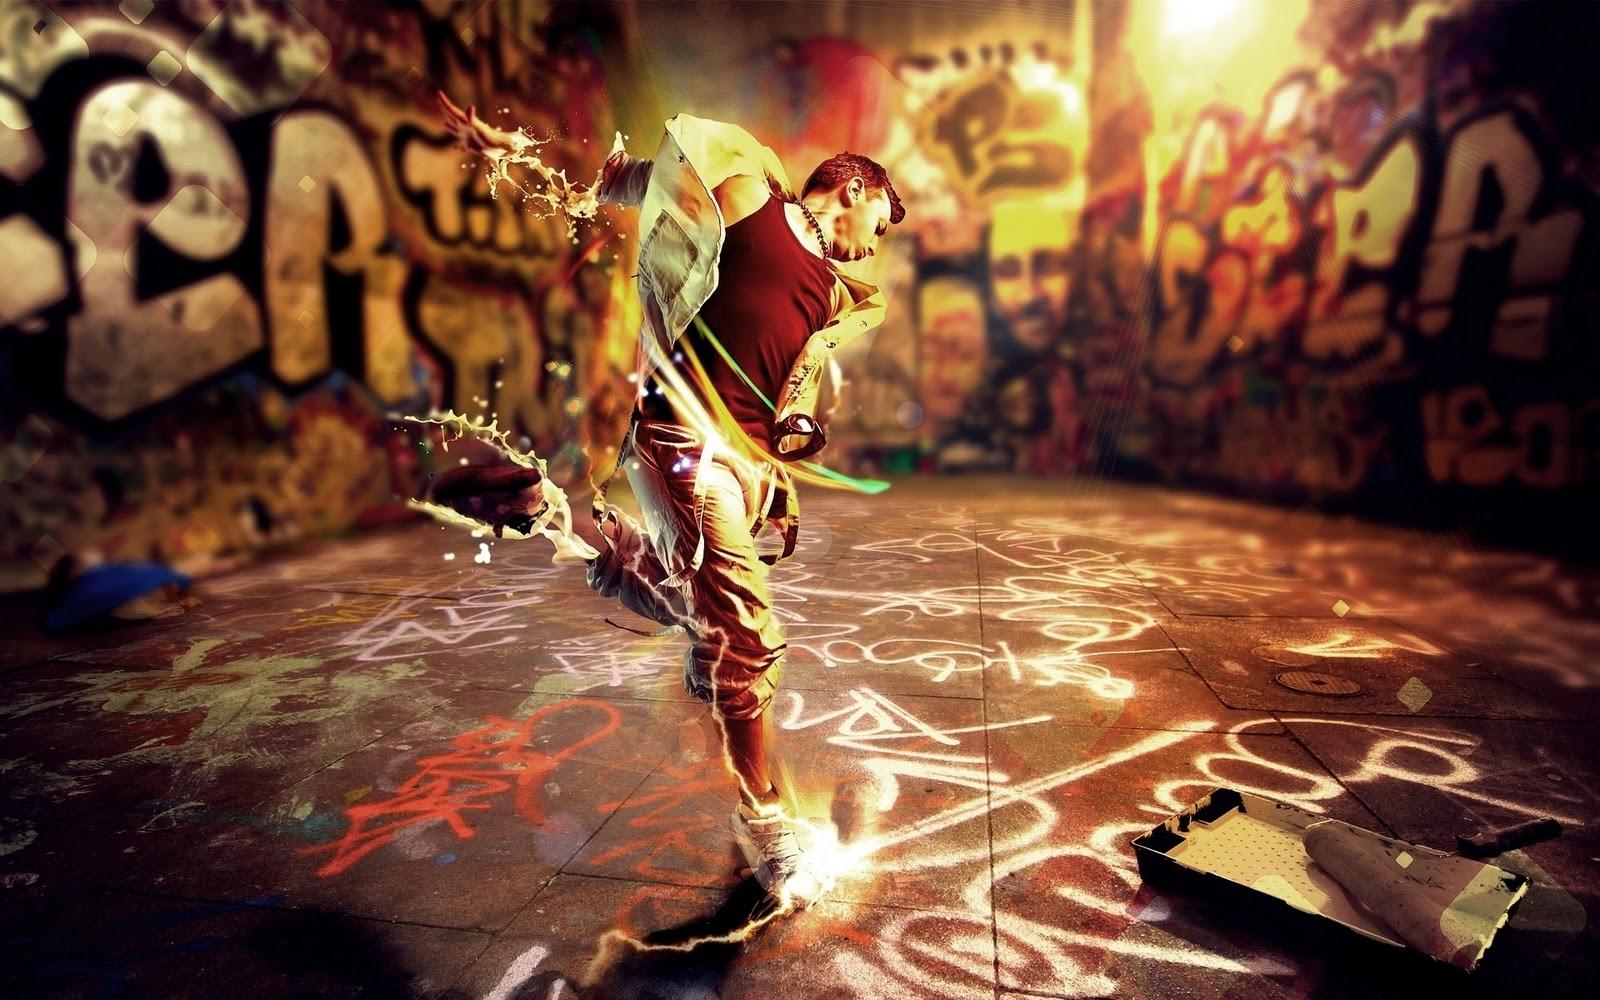 https://4.bp.blogspot.com/-r2Iuslvon1k/Tt8Ofe8bNCI/AAAAAAAAAd4/cWx-RhKKykg/s1600/Dance%20Movement%20Boy%20Gr graffiti%20Rhythm%20Energy%20Music%20Style%20-%Wallpaper%20HD 20UniqueWalls.Blogspot.Com.jpg